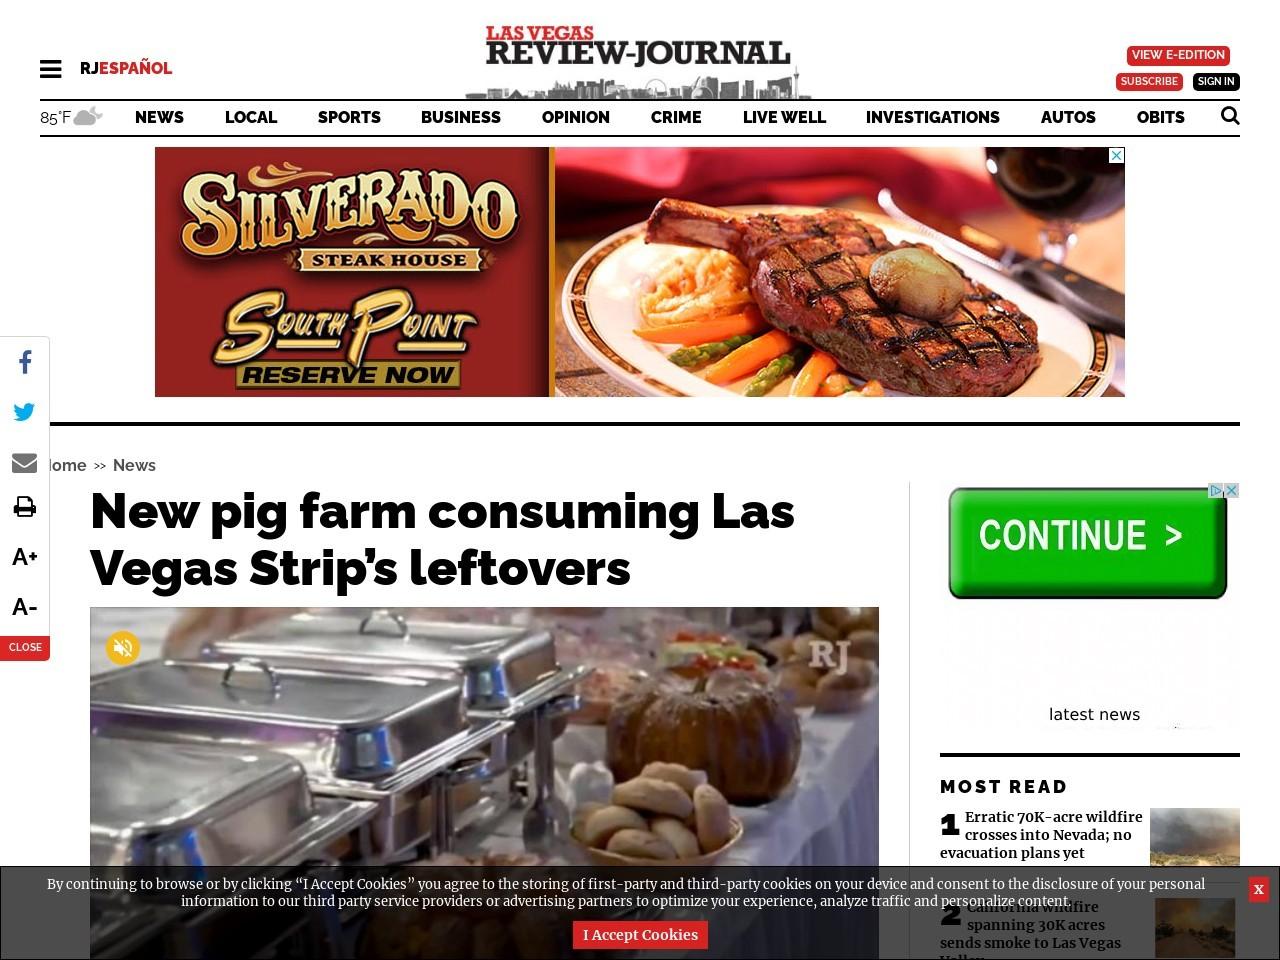 New pig farm consuming Las Vegas Strip's leftovers